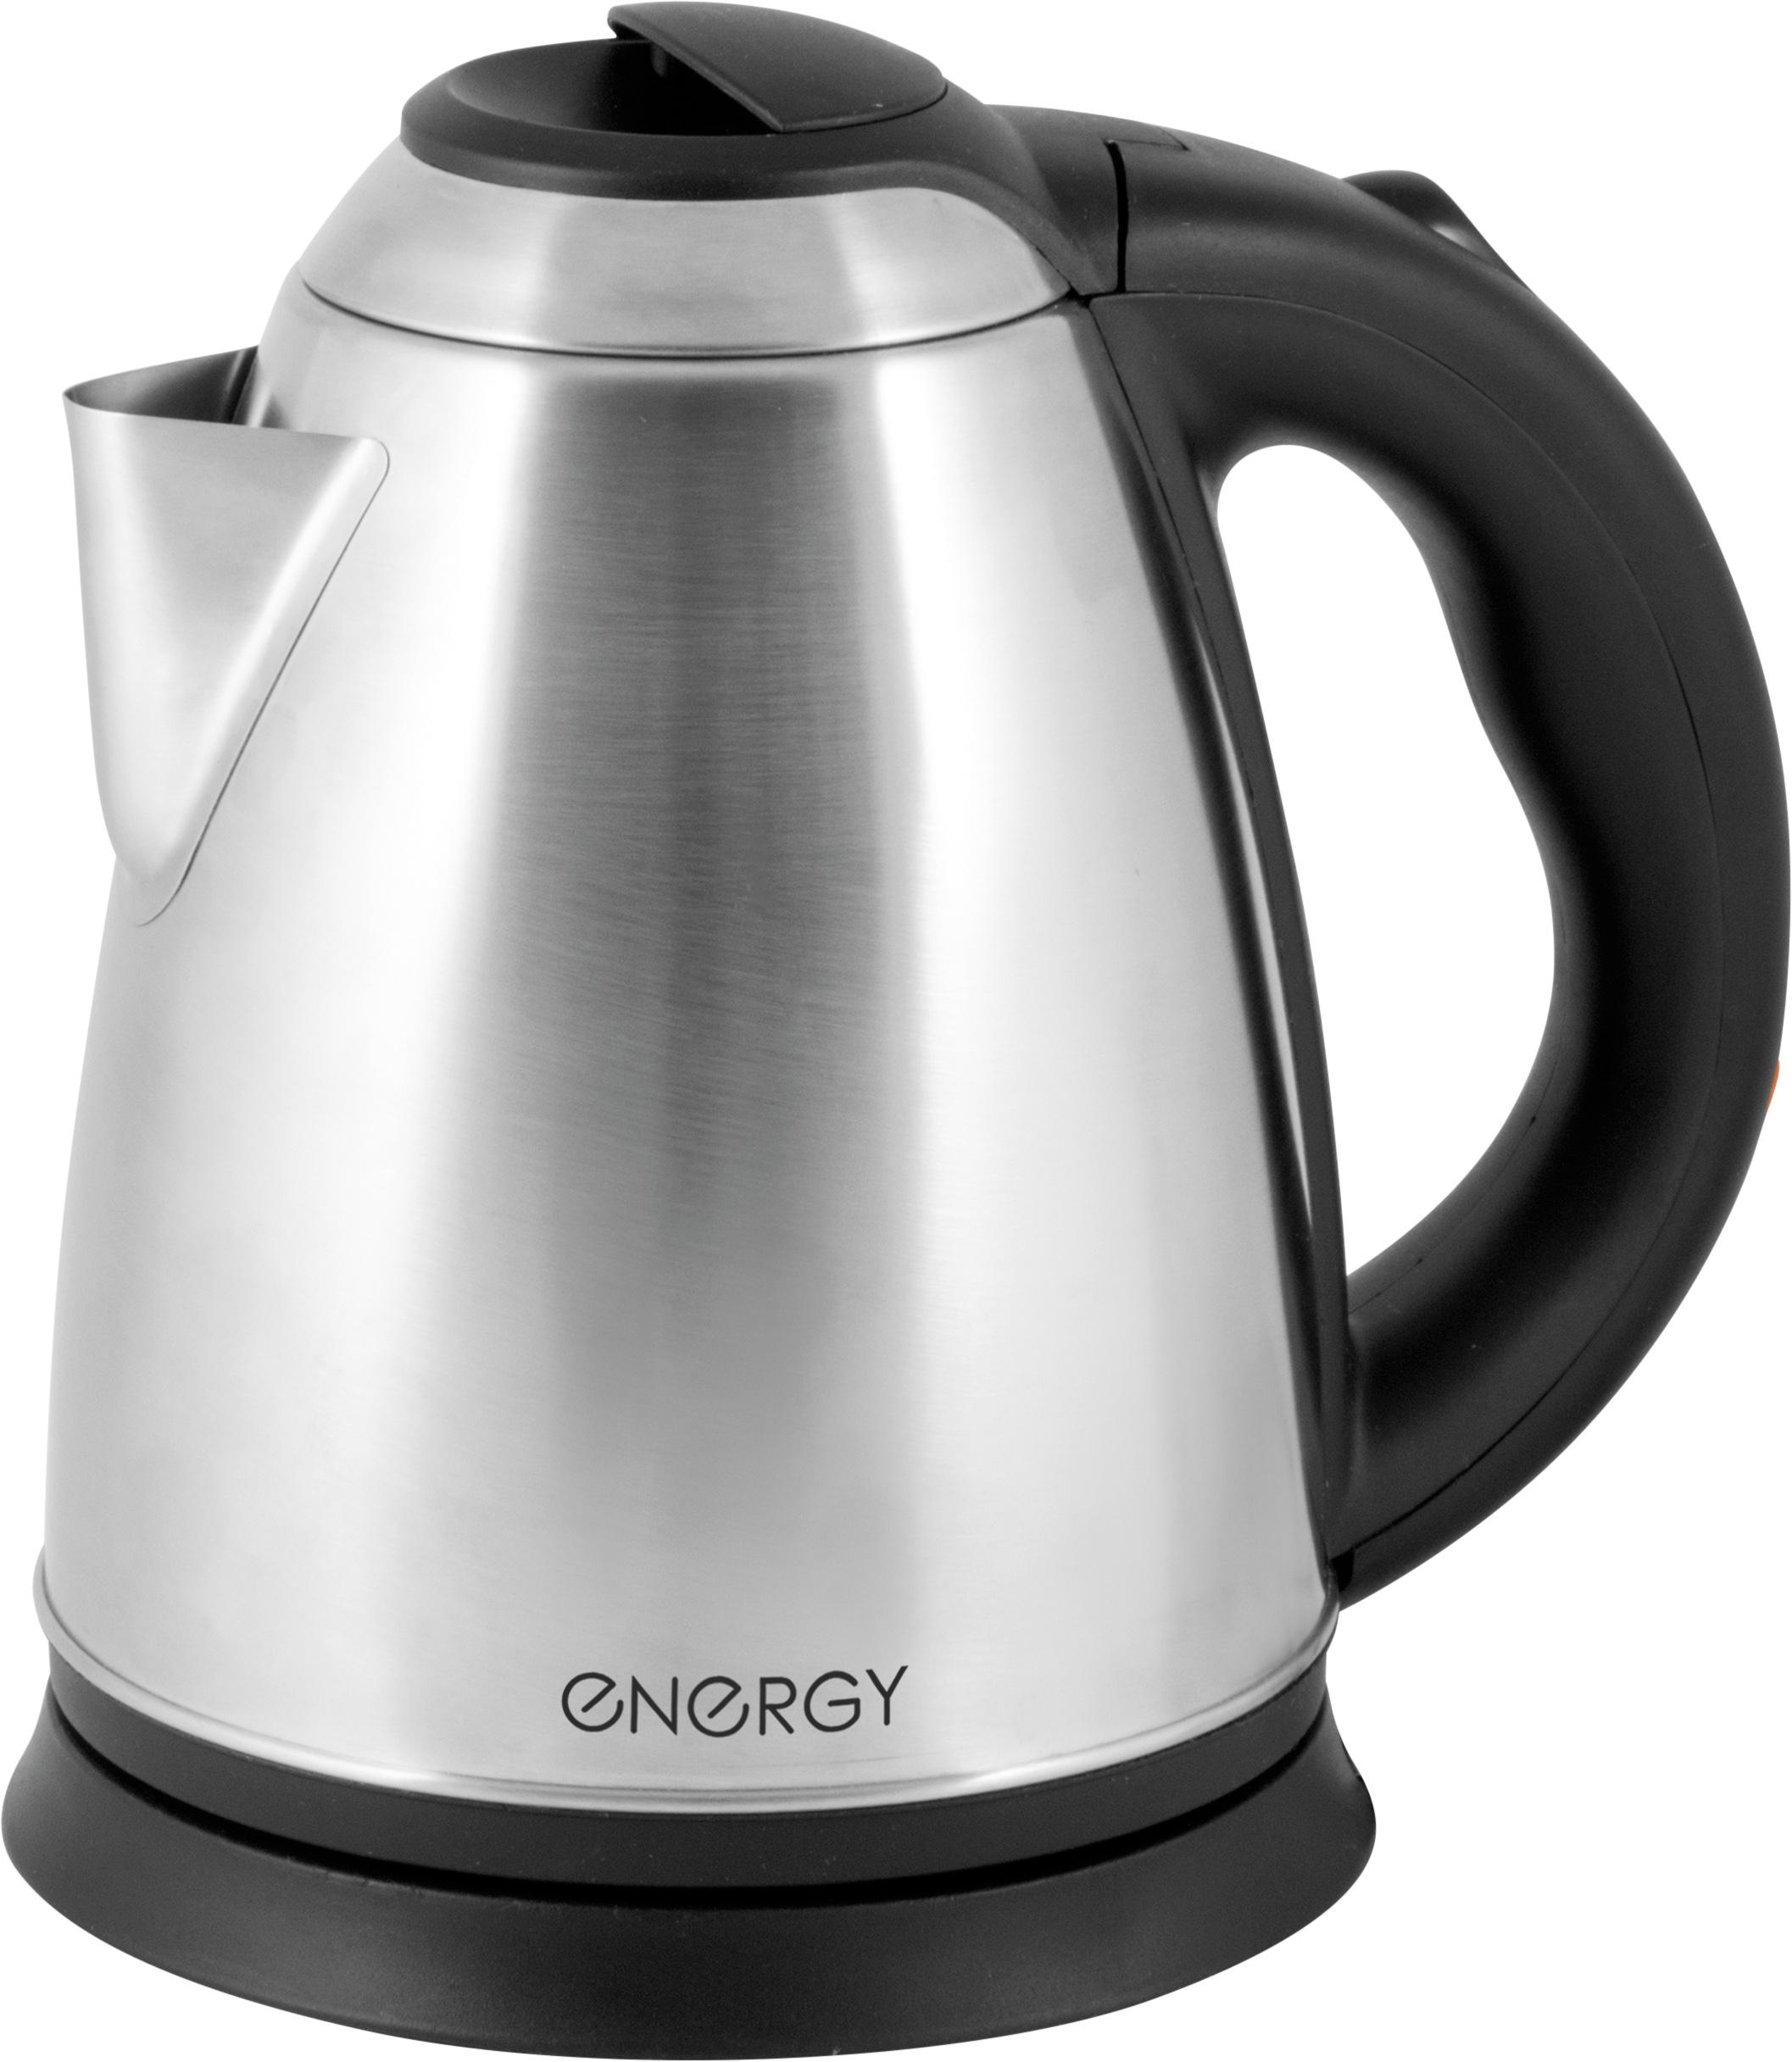 Электрический чайник ENERGY E-291, 54 004690, серебристый чайник leben 291 003